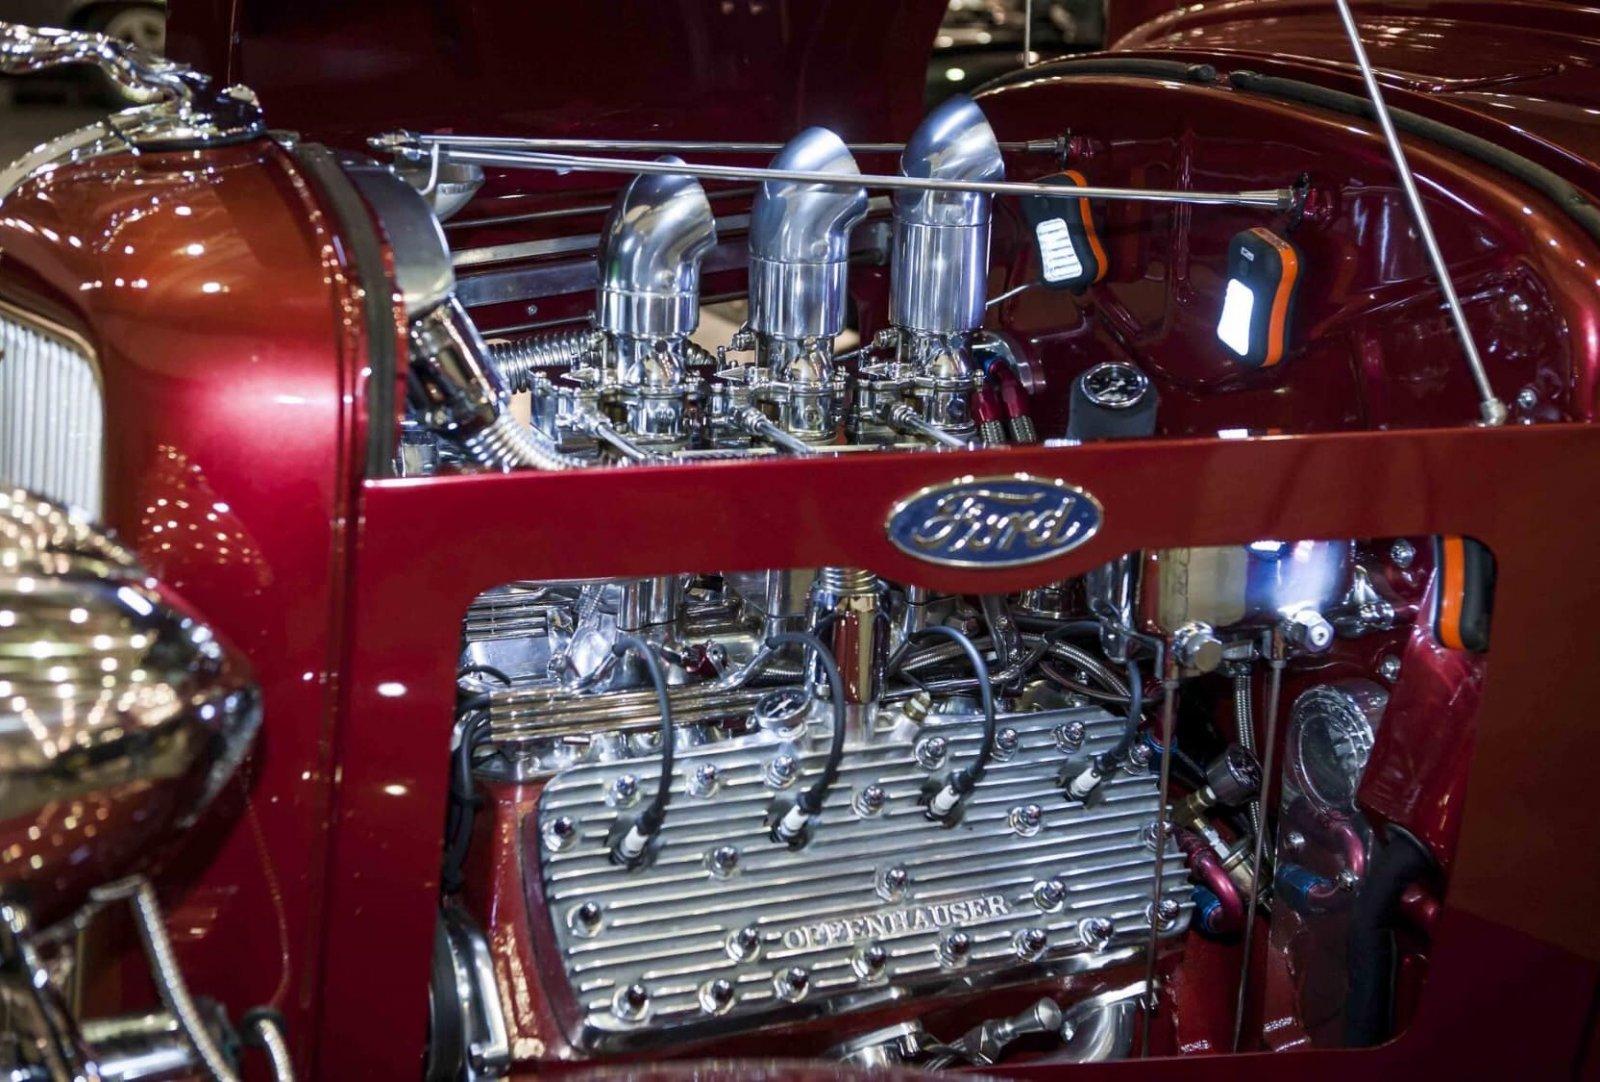 1934 Ford Flathead With Full Race Cam 3 Carbs 5.jpg